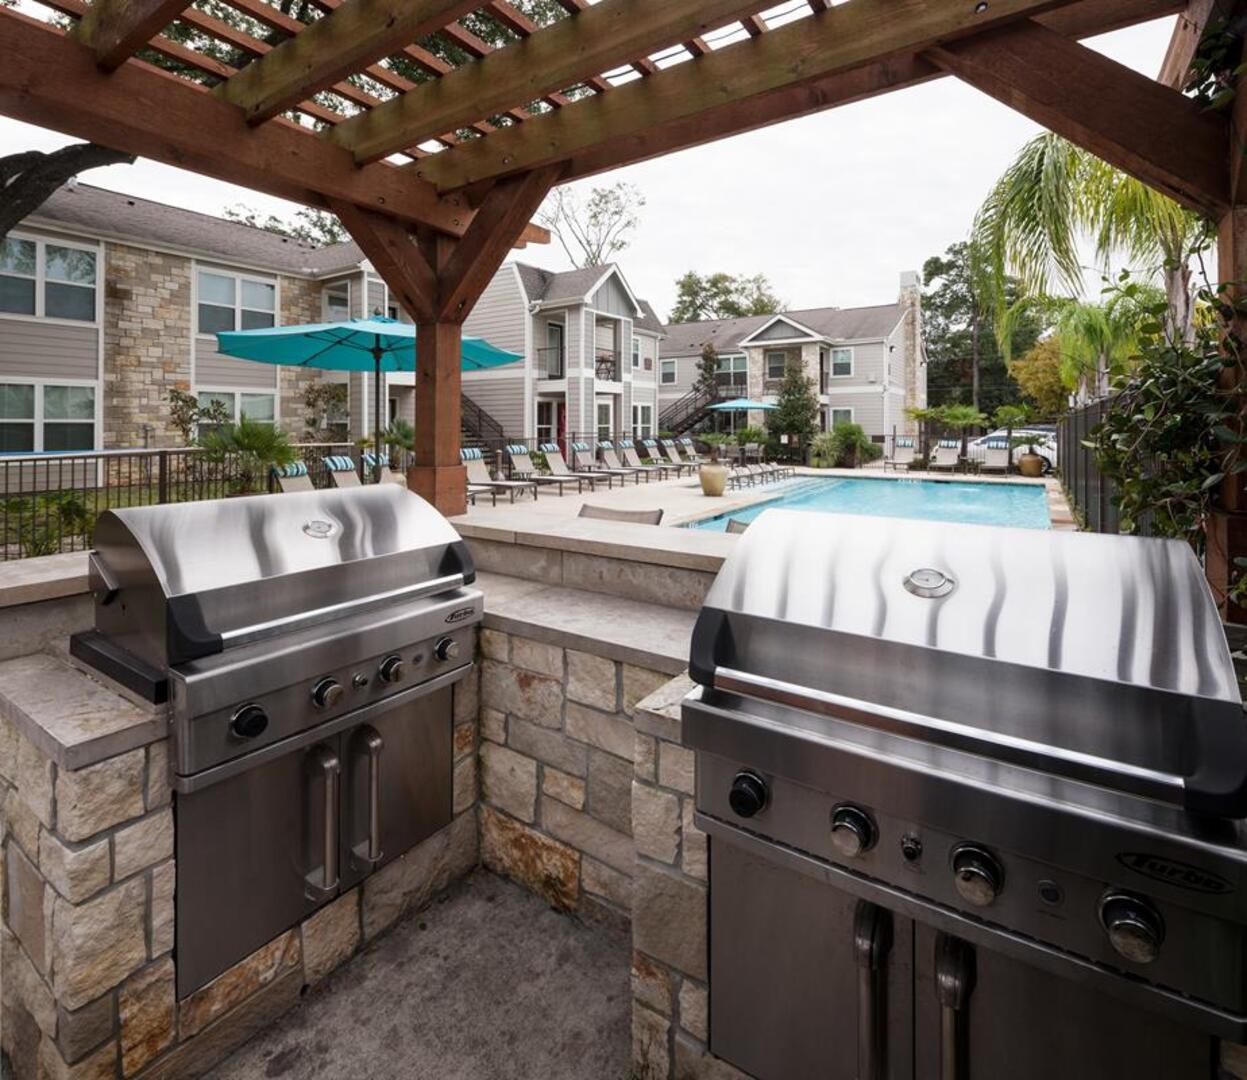 Photos Of Reserve At Garden Oaks Apartments Houston, TX